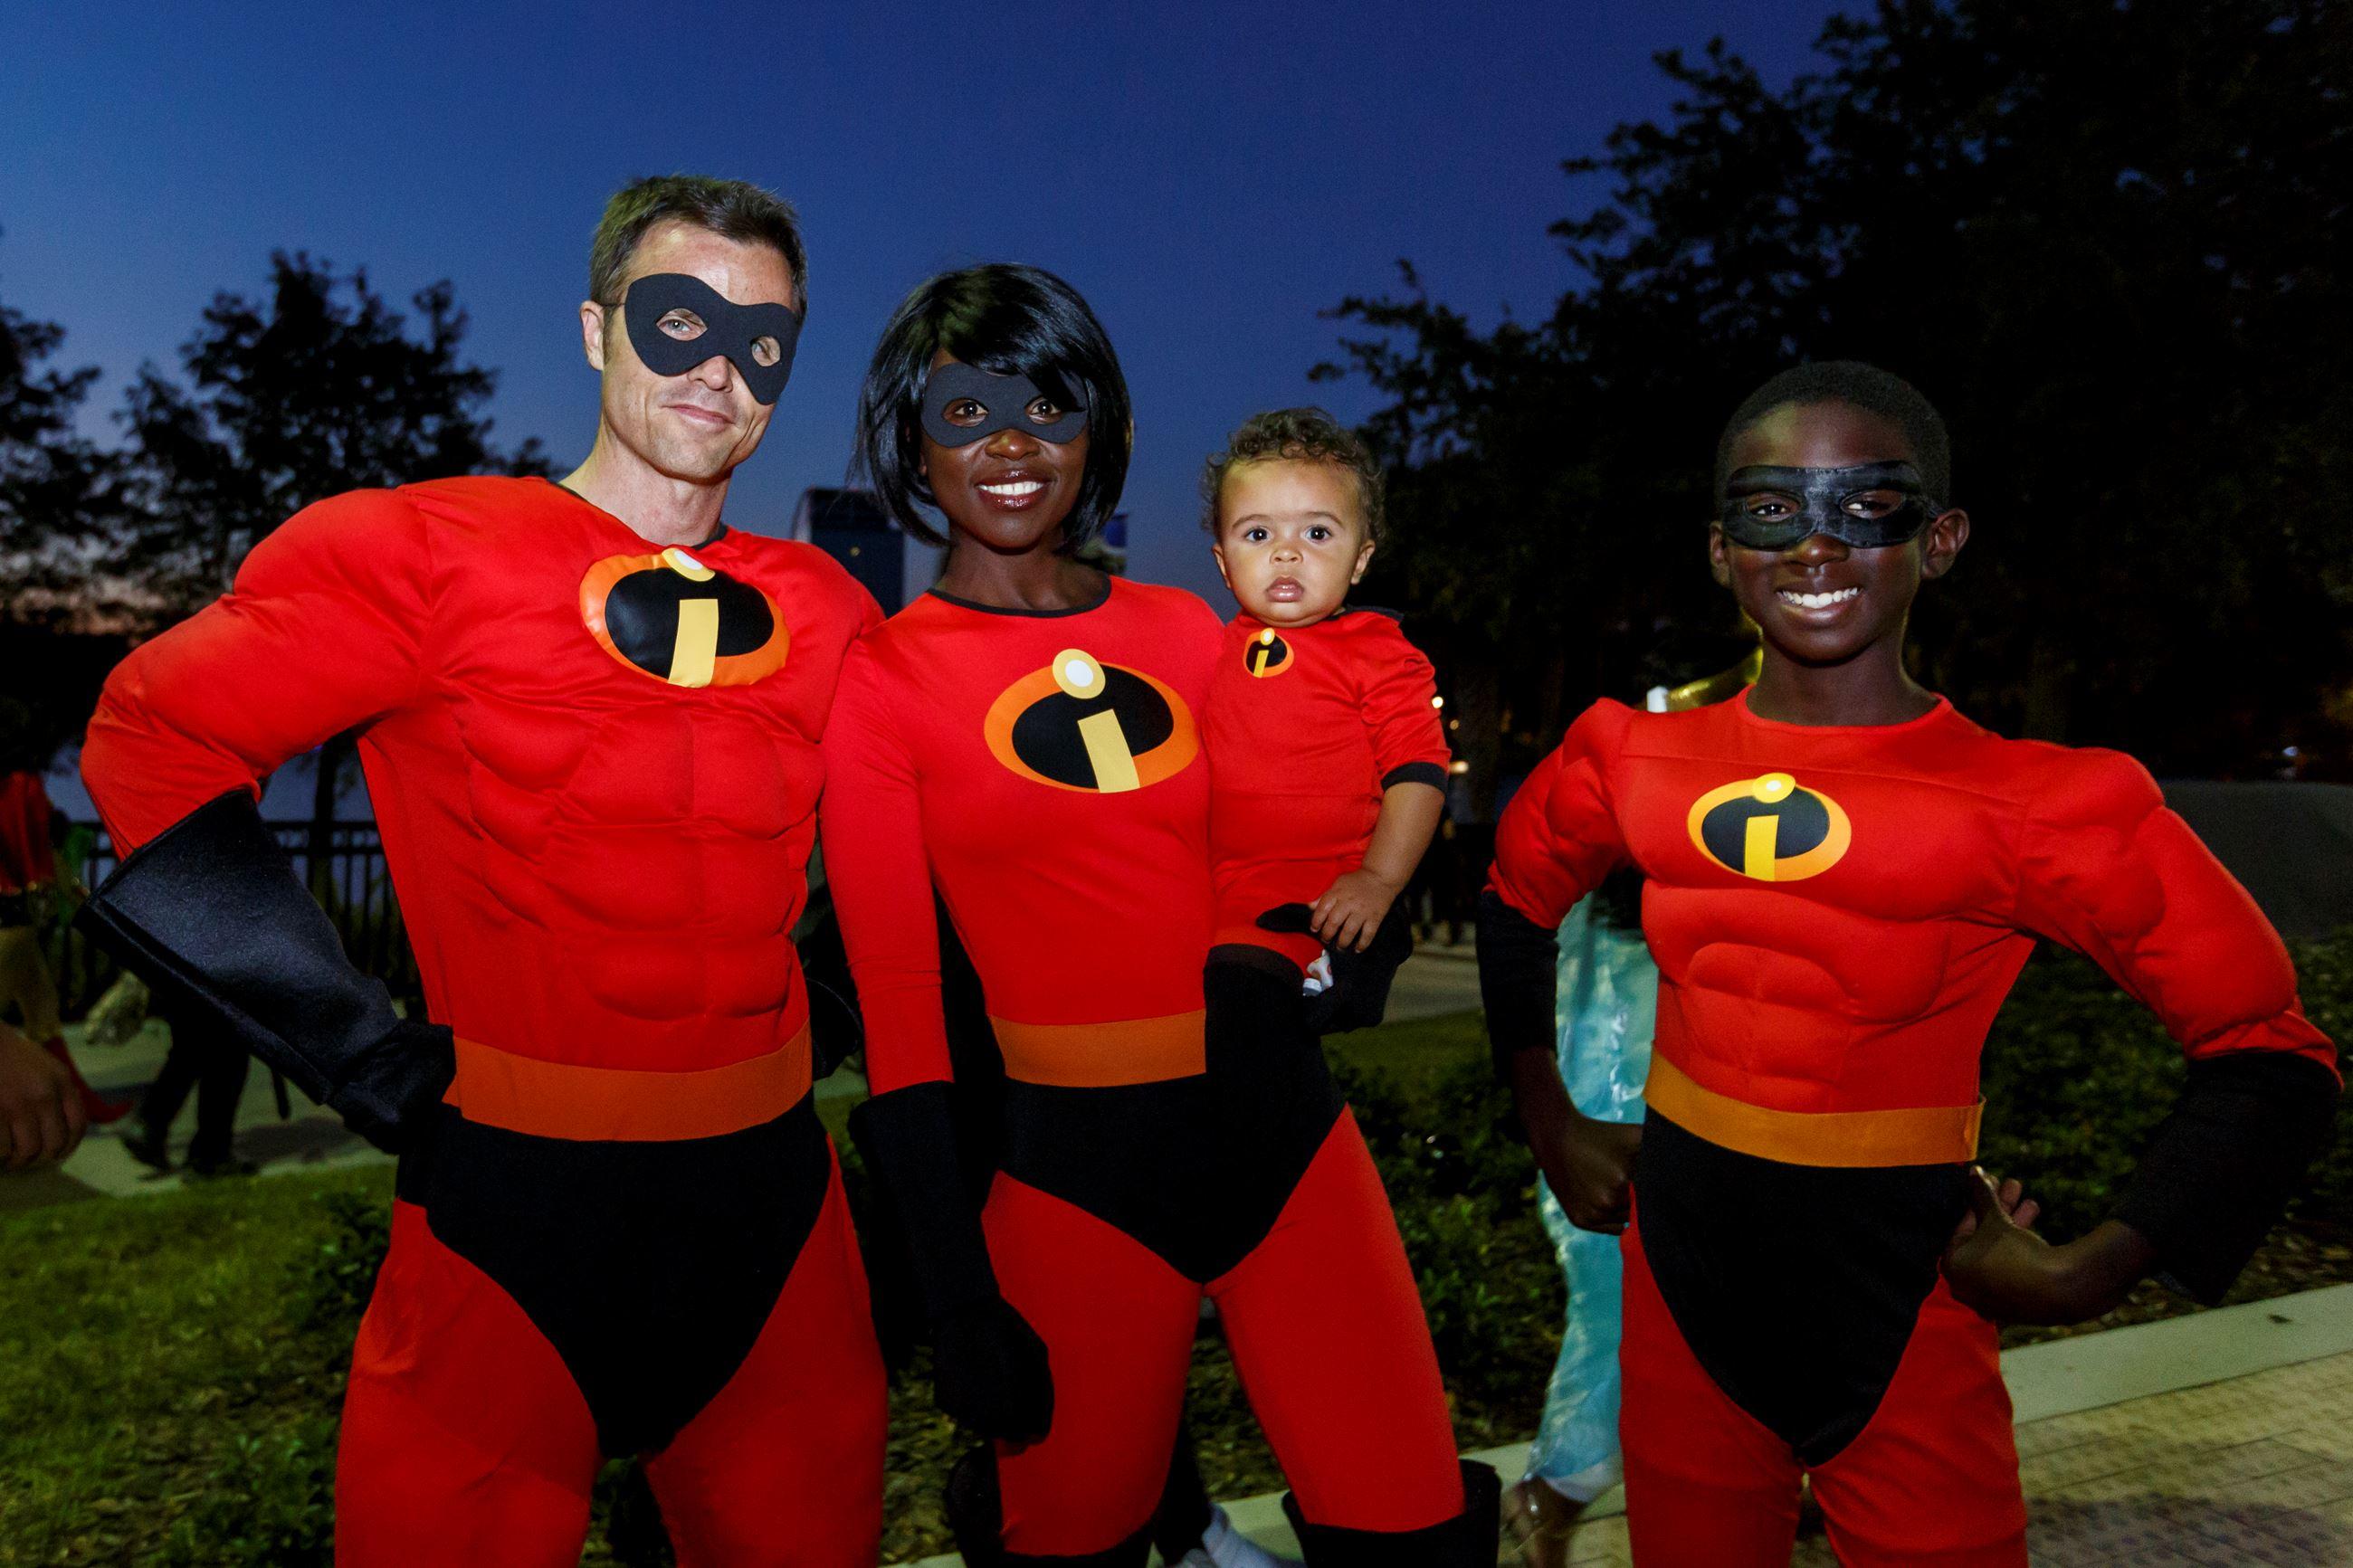 Cranes Roost Halloween 2020 Halloween at Cranes Roost Park | Altamonte Springs, FL   Official